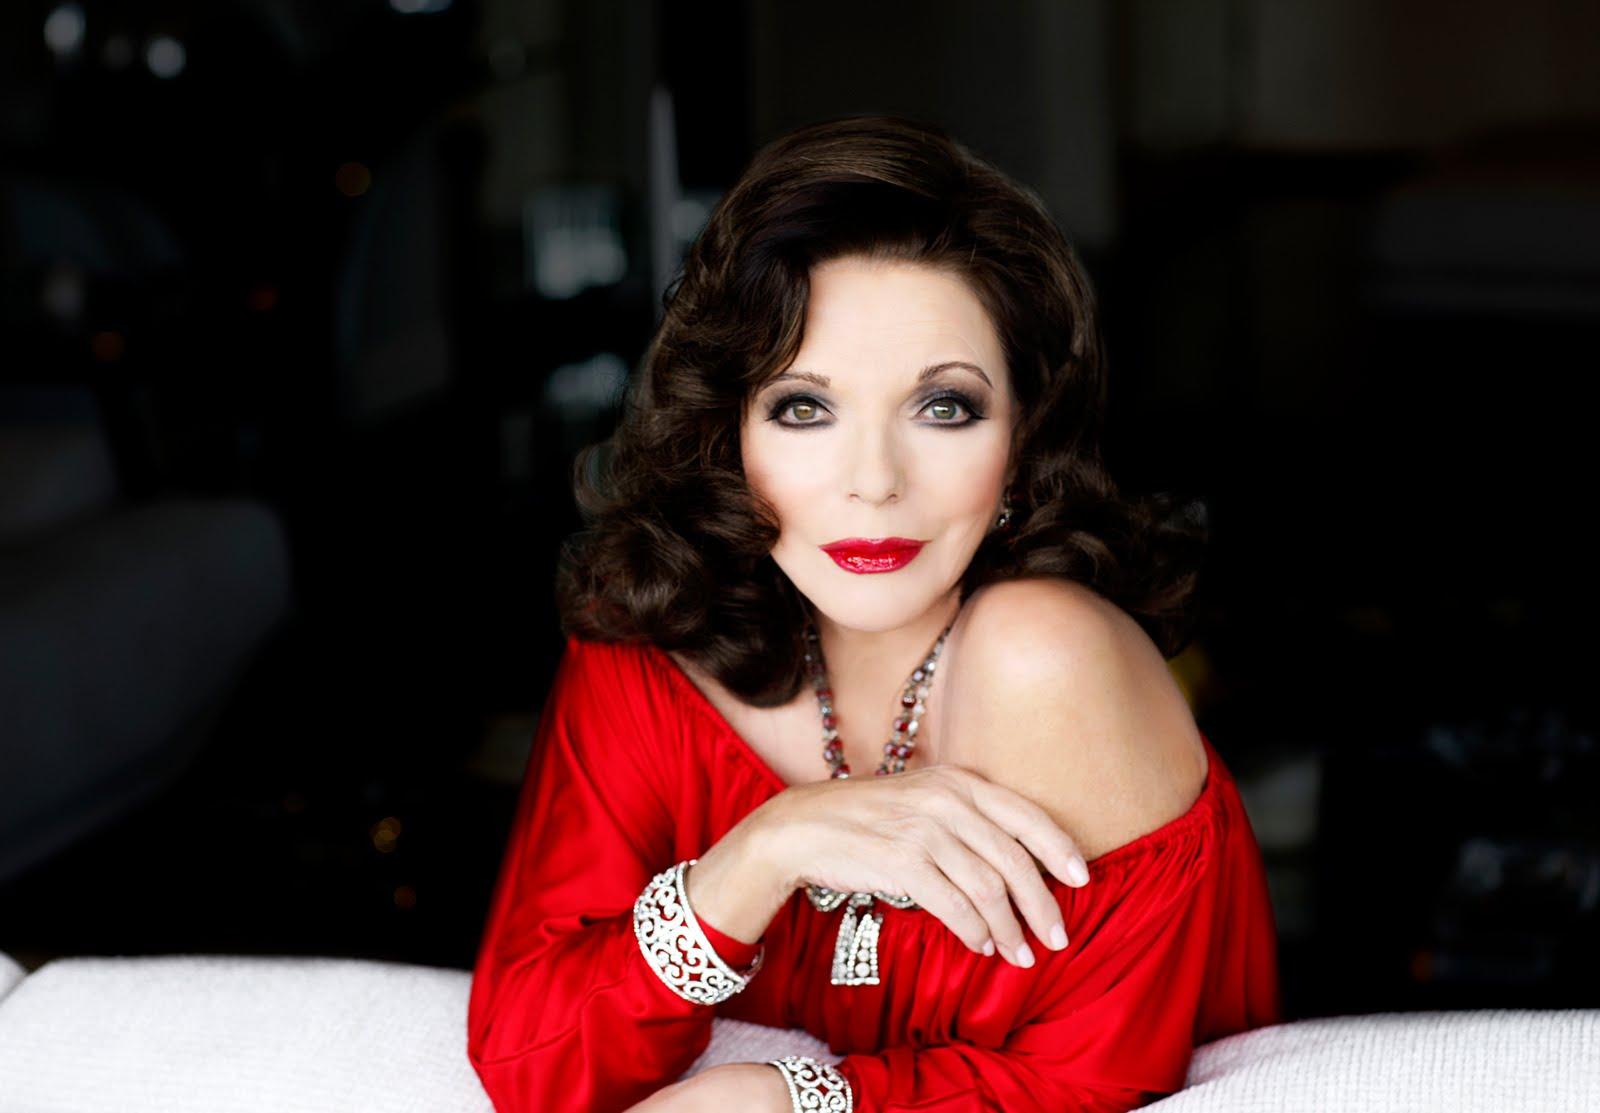 http://3.bp.blogspot.com/_wWwp4Xnlnhs/TAFZQuYFE0I/AAAAAAAAAGk/IbjQ86kXoxs/s1600/Joan+Collins.jpg